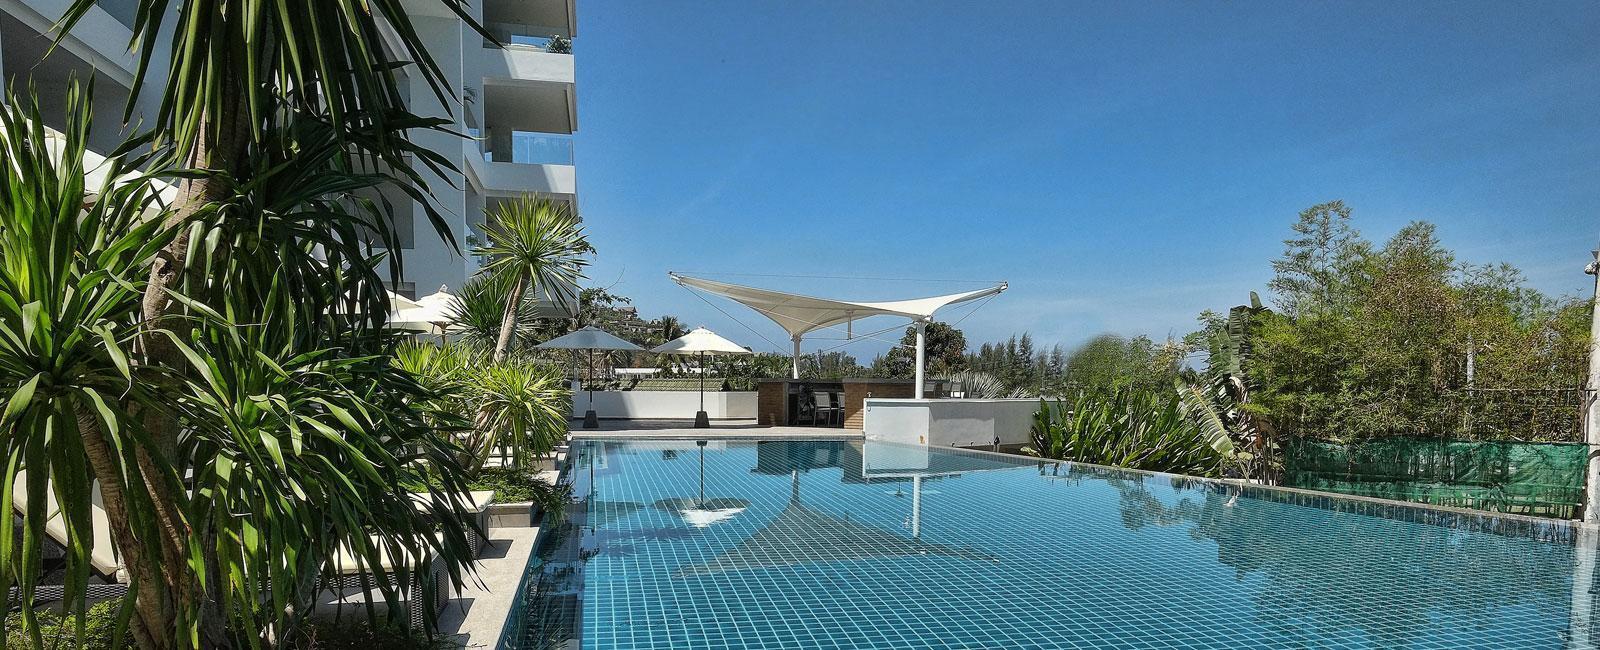 5B Sea view Surin Sunsuri 160 sqm! near the beach อพาร์ตเมนต์ 2 ห้องนอน 2 ห้องน้ำส่วนตัว ขนาด 160 ตร.ม. – สุรินทร์